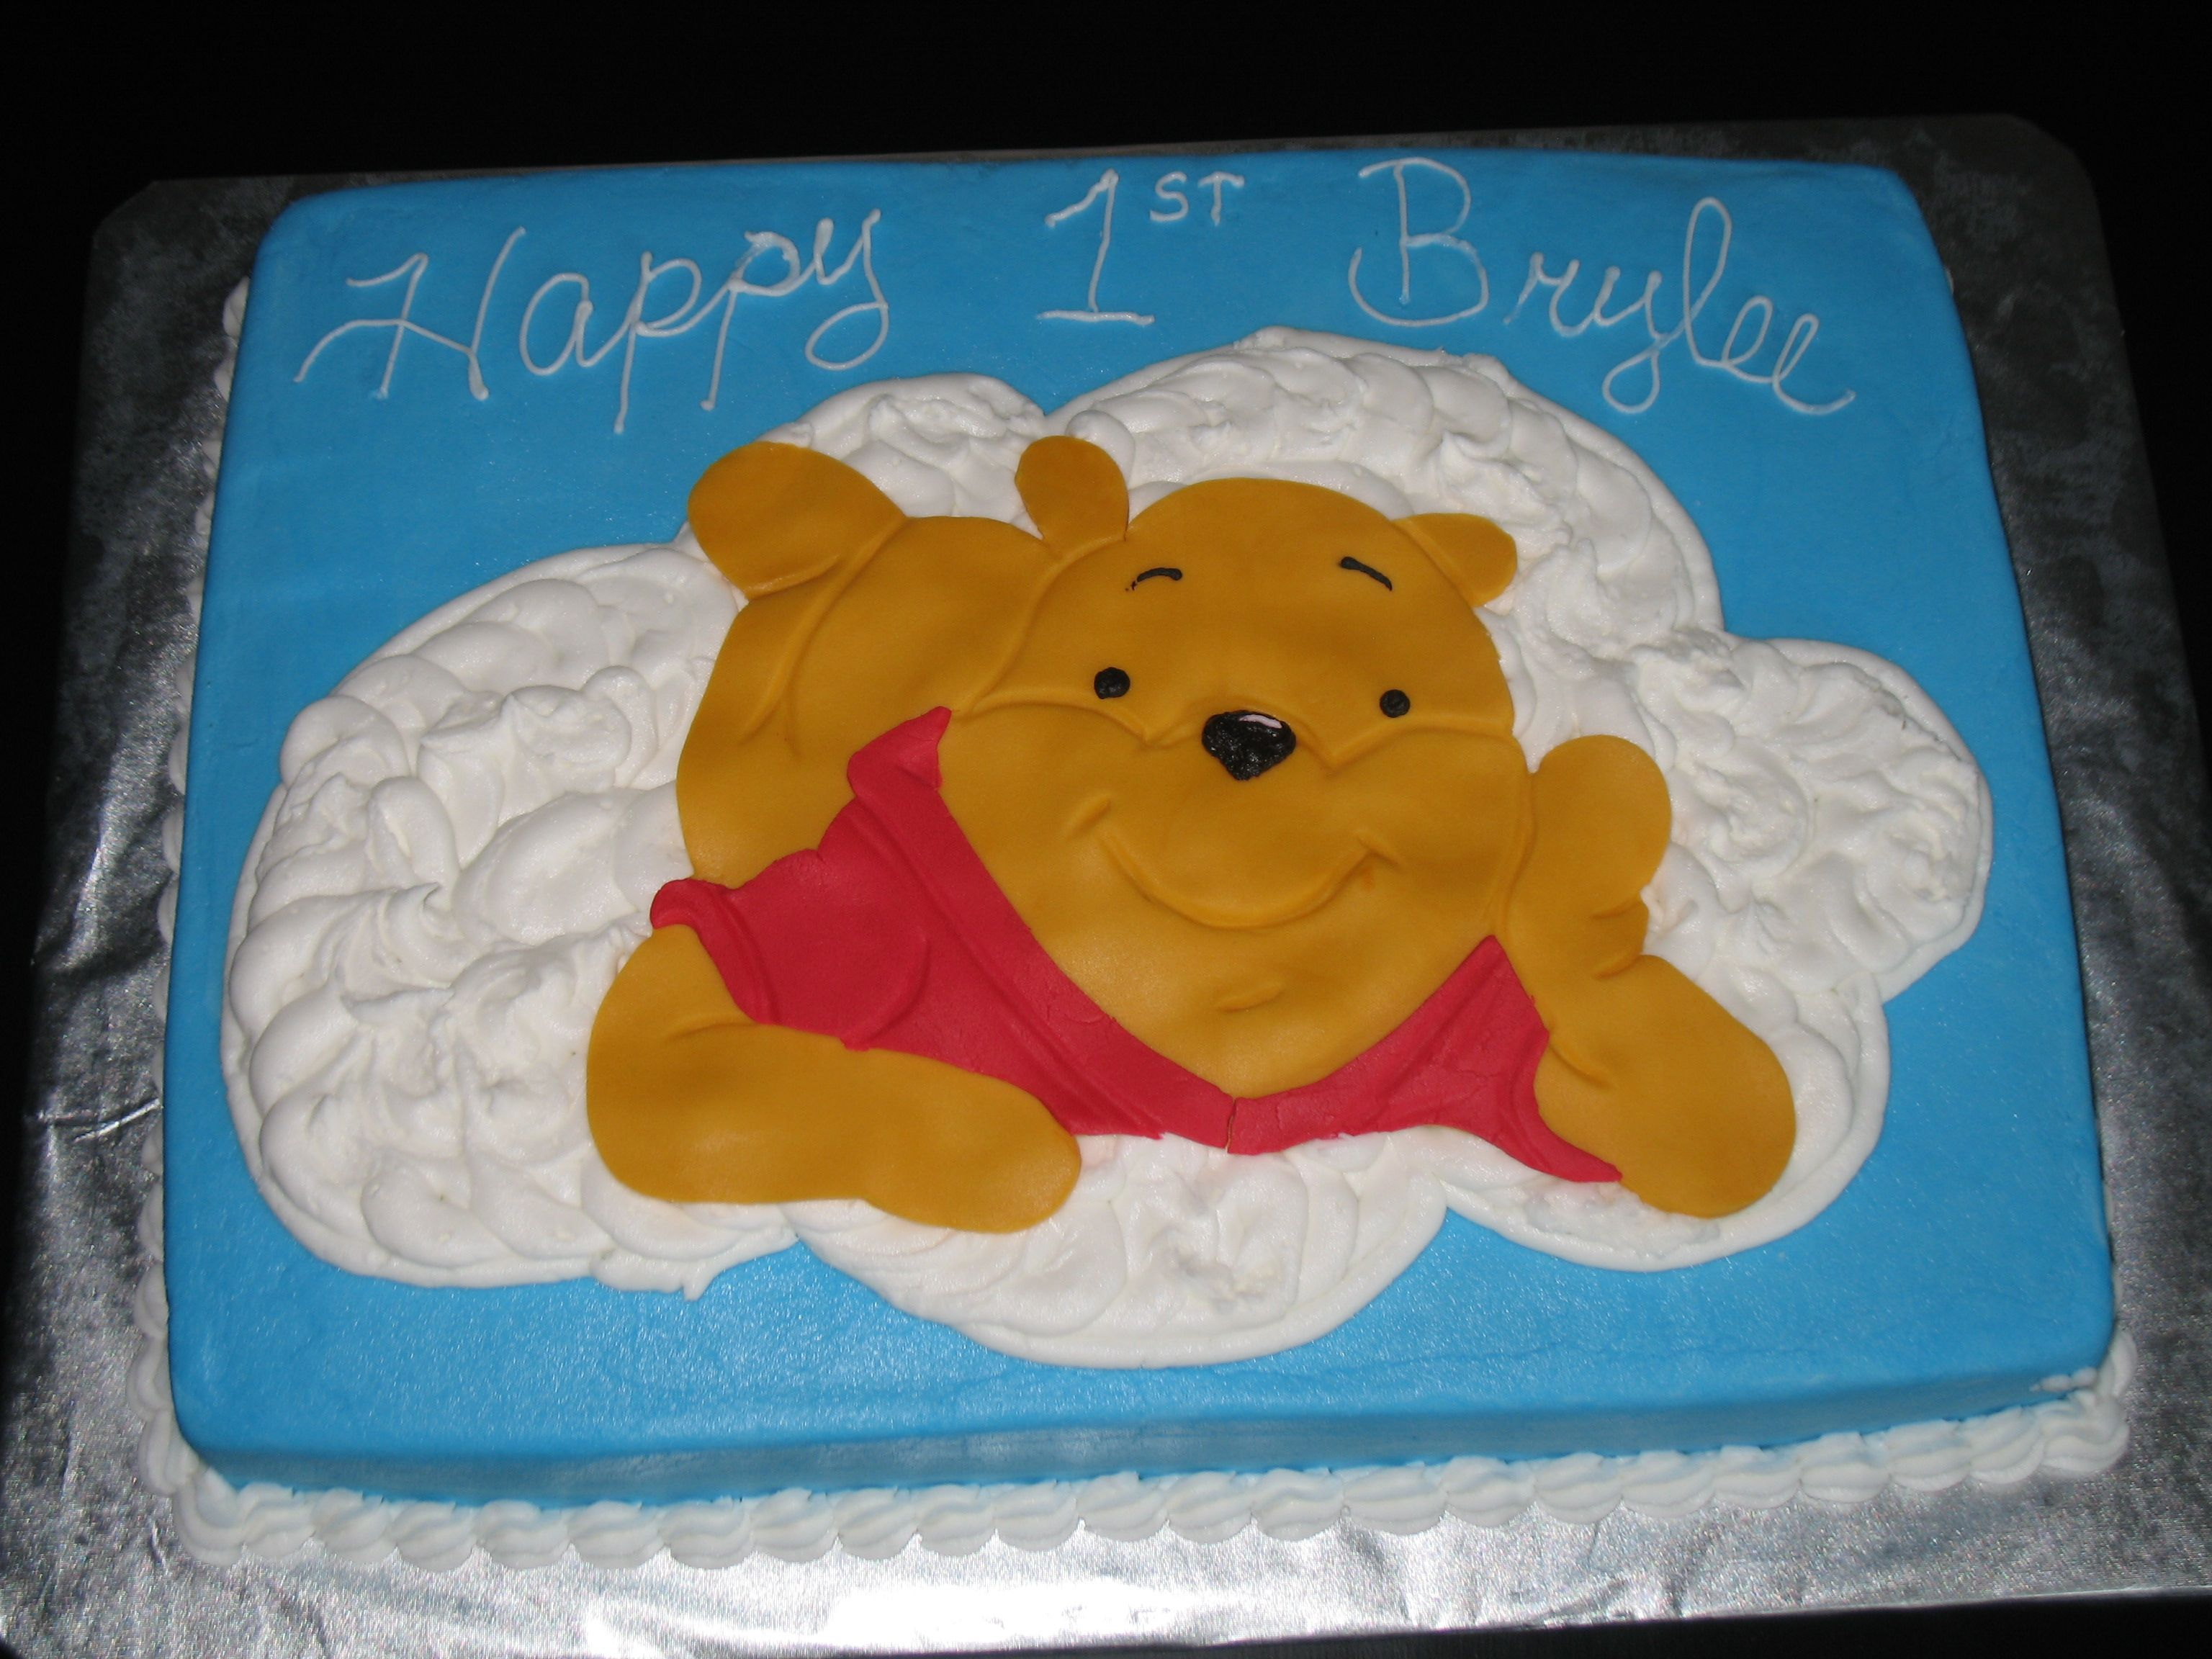 Pooh 1st Birthday! Kids 1st Birthday Cake Designs ...